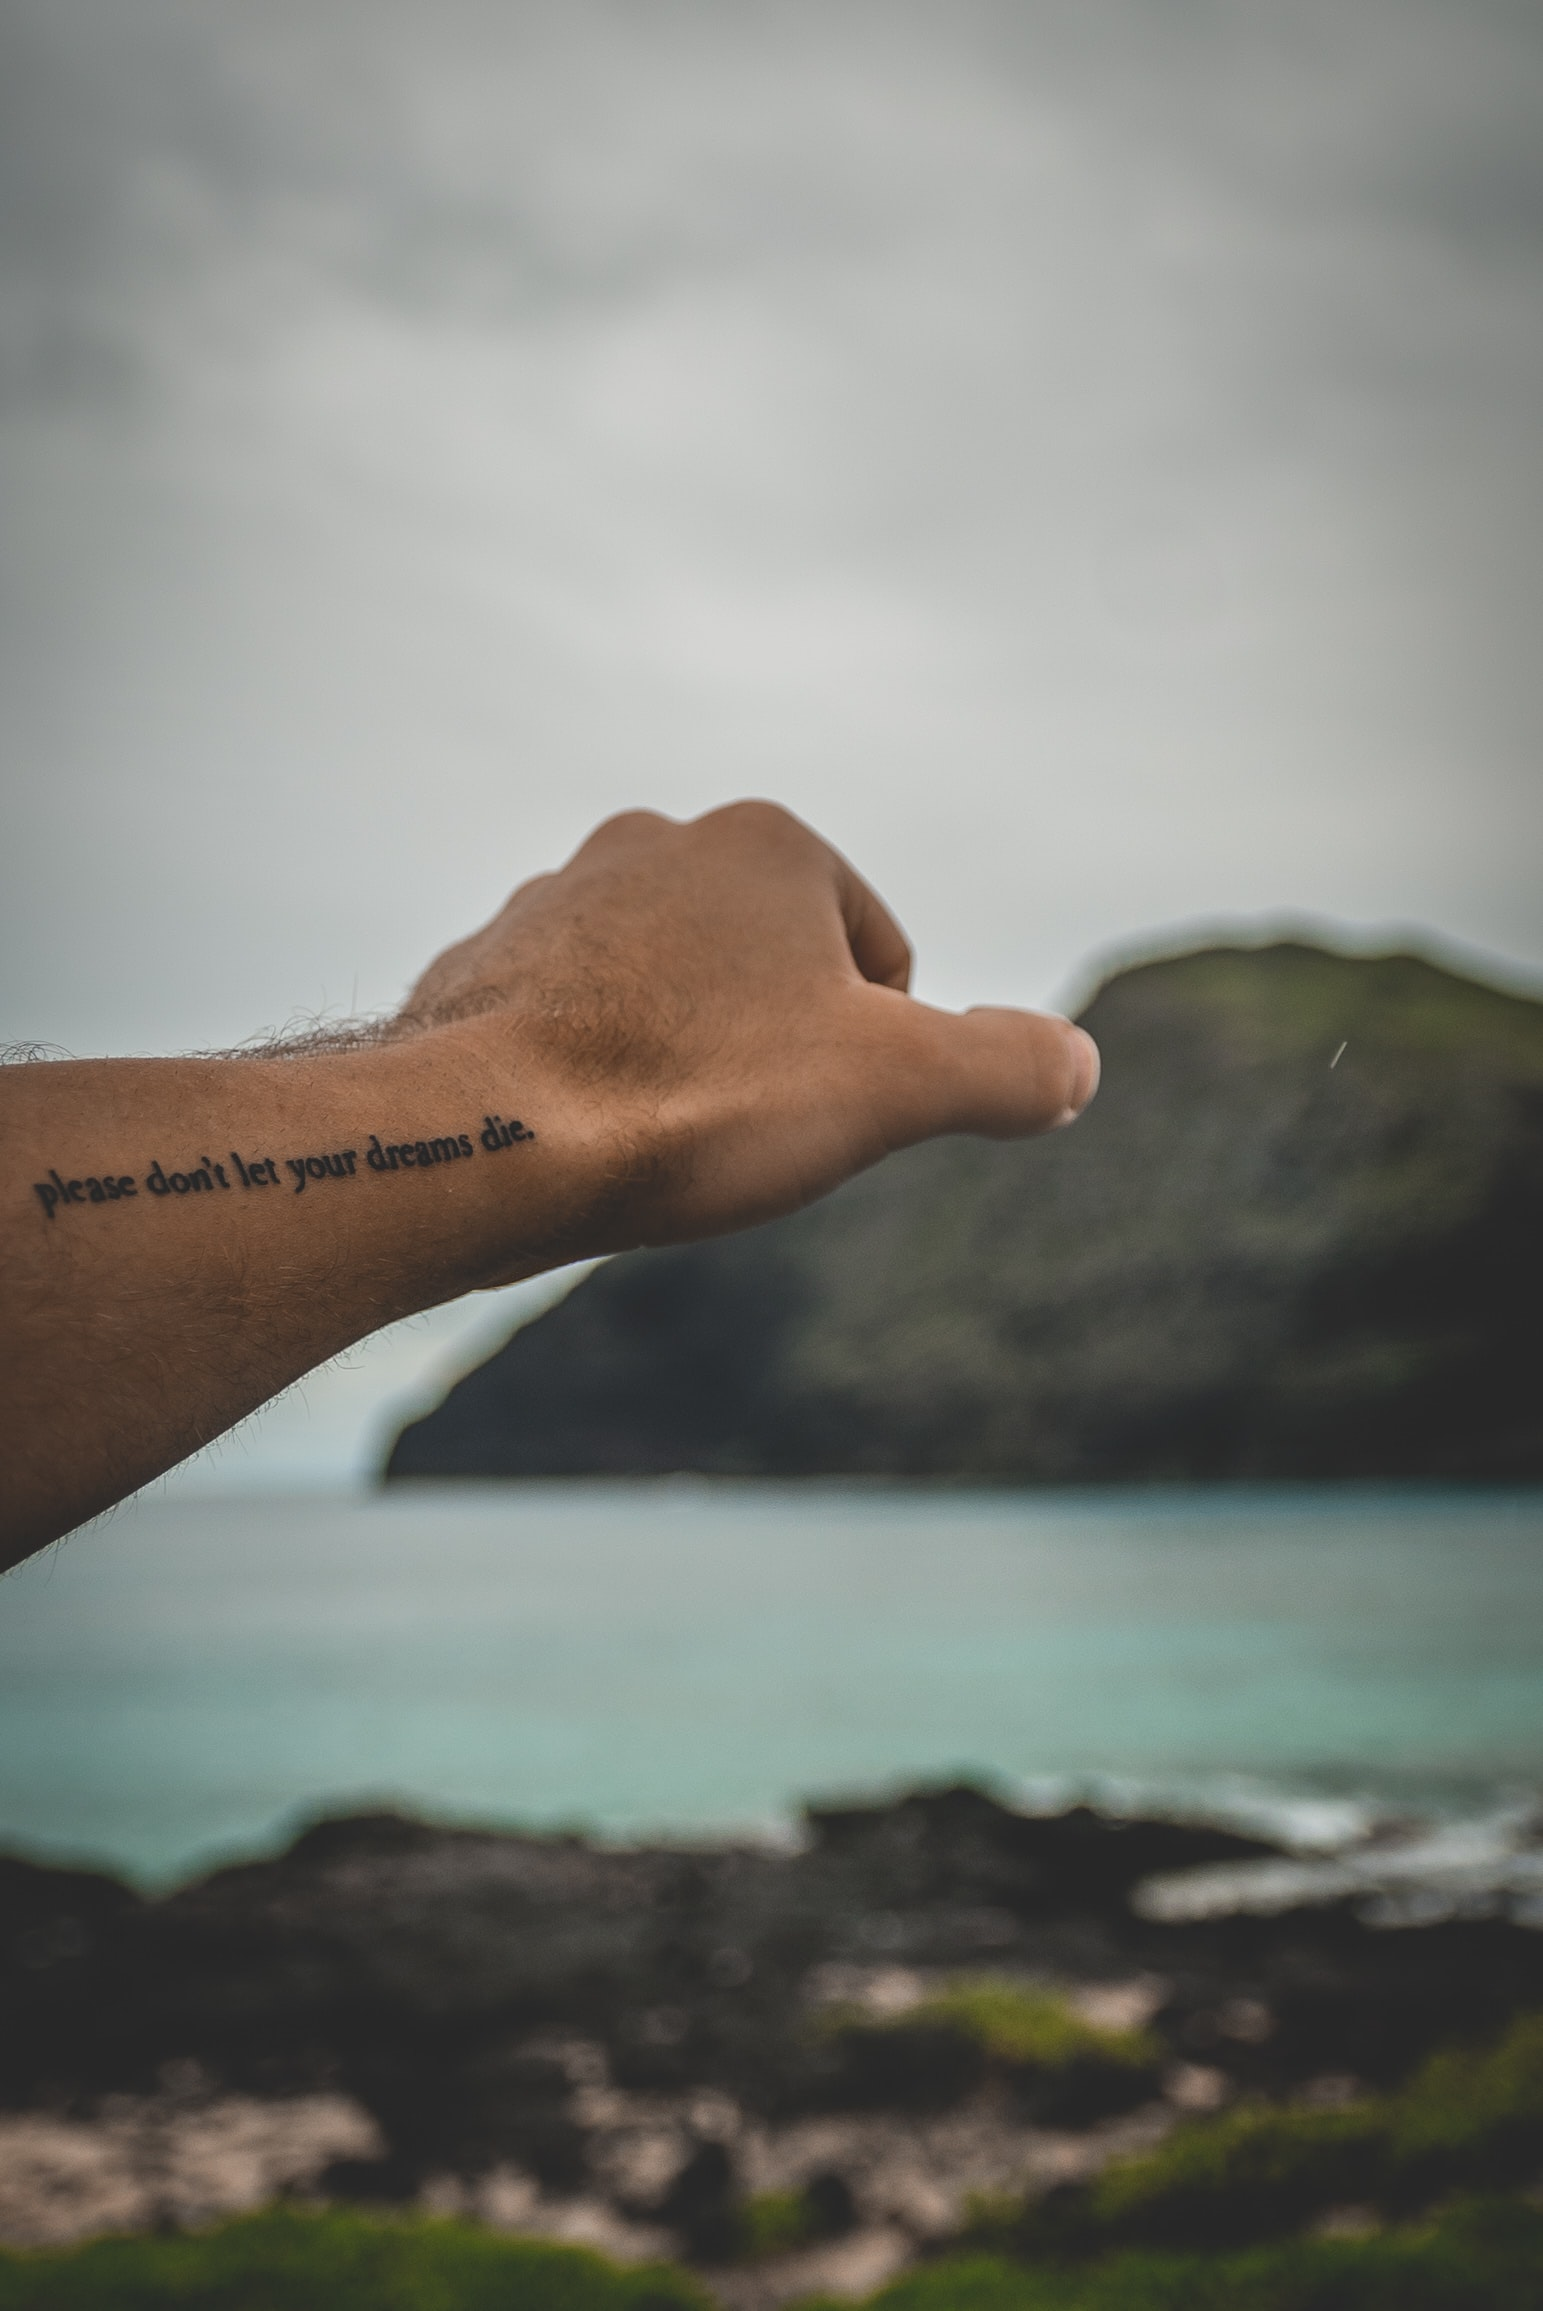 Tattoo 15 Best Free Tattoo Man Hand And Ink Photos On Unsplash